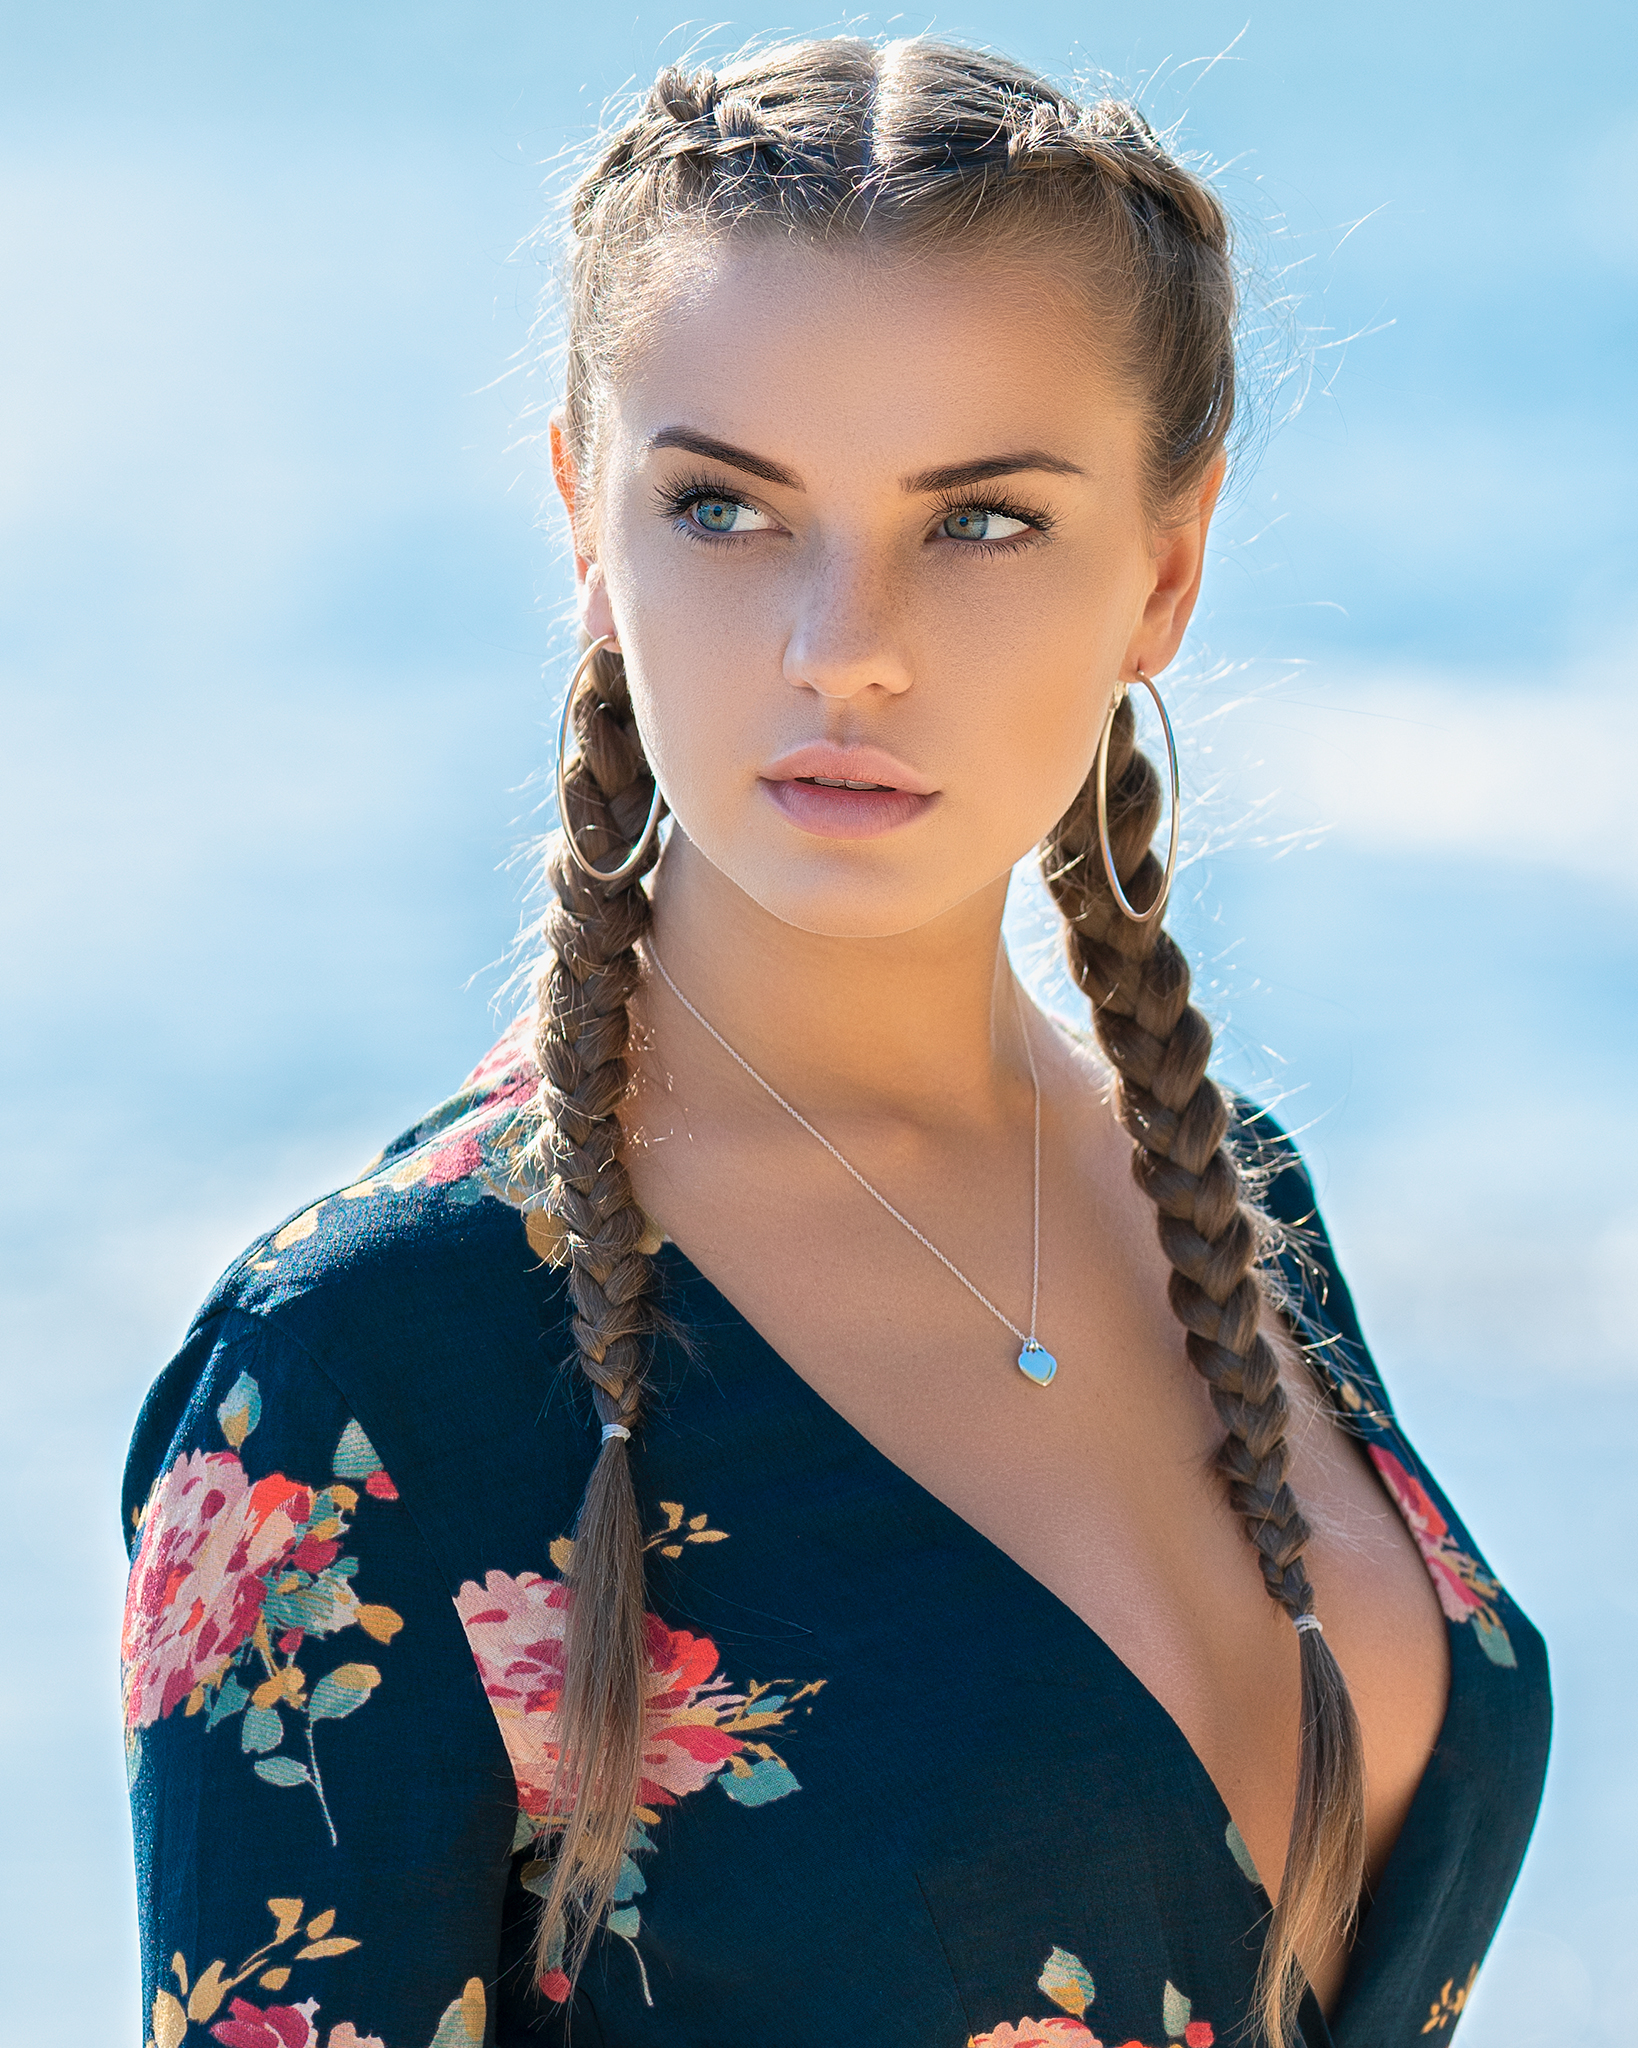 portrait hair girl, Daniel Bidiuk